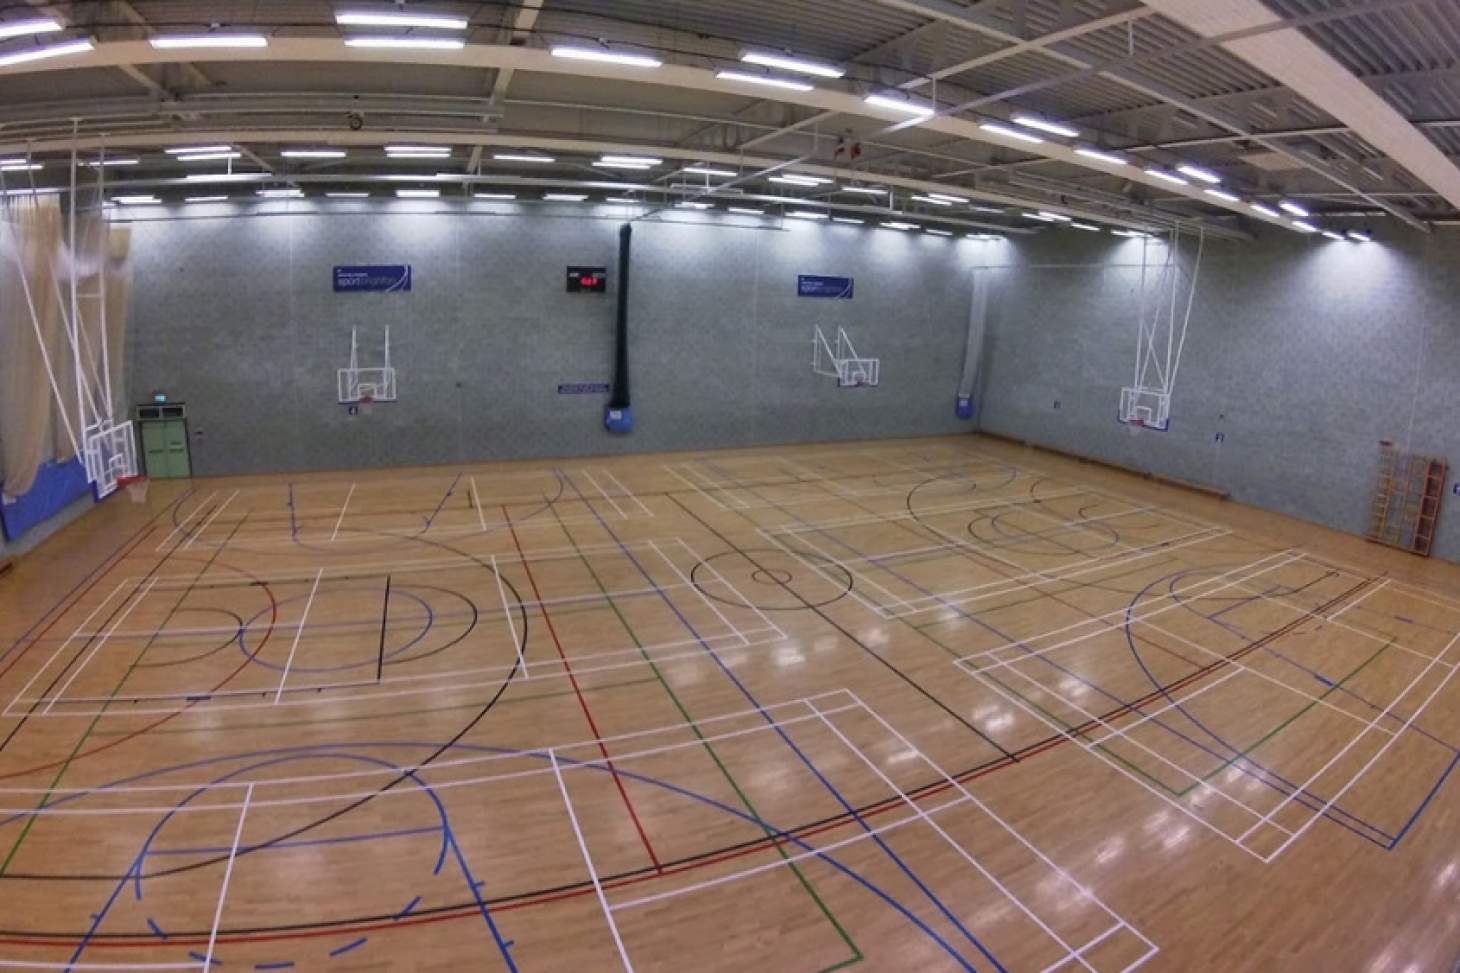 University Of Brighton (Falmer Campus) Indoor basketball court